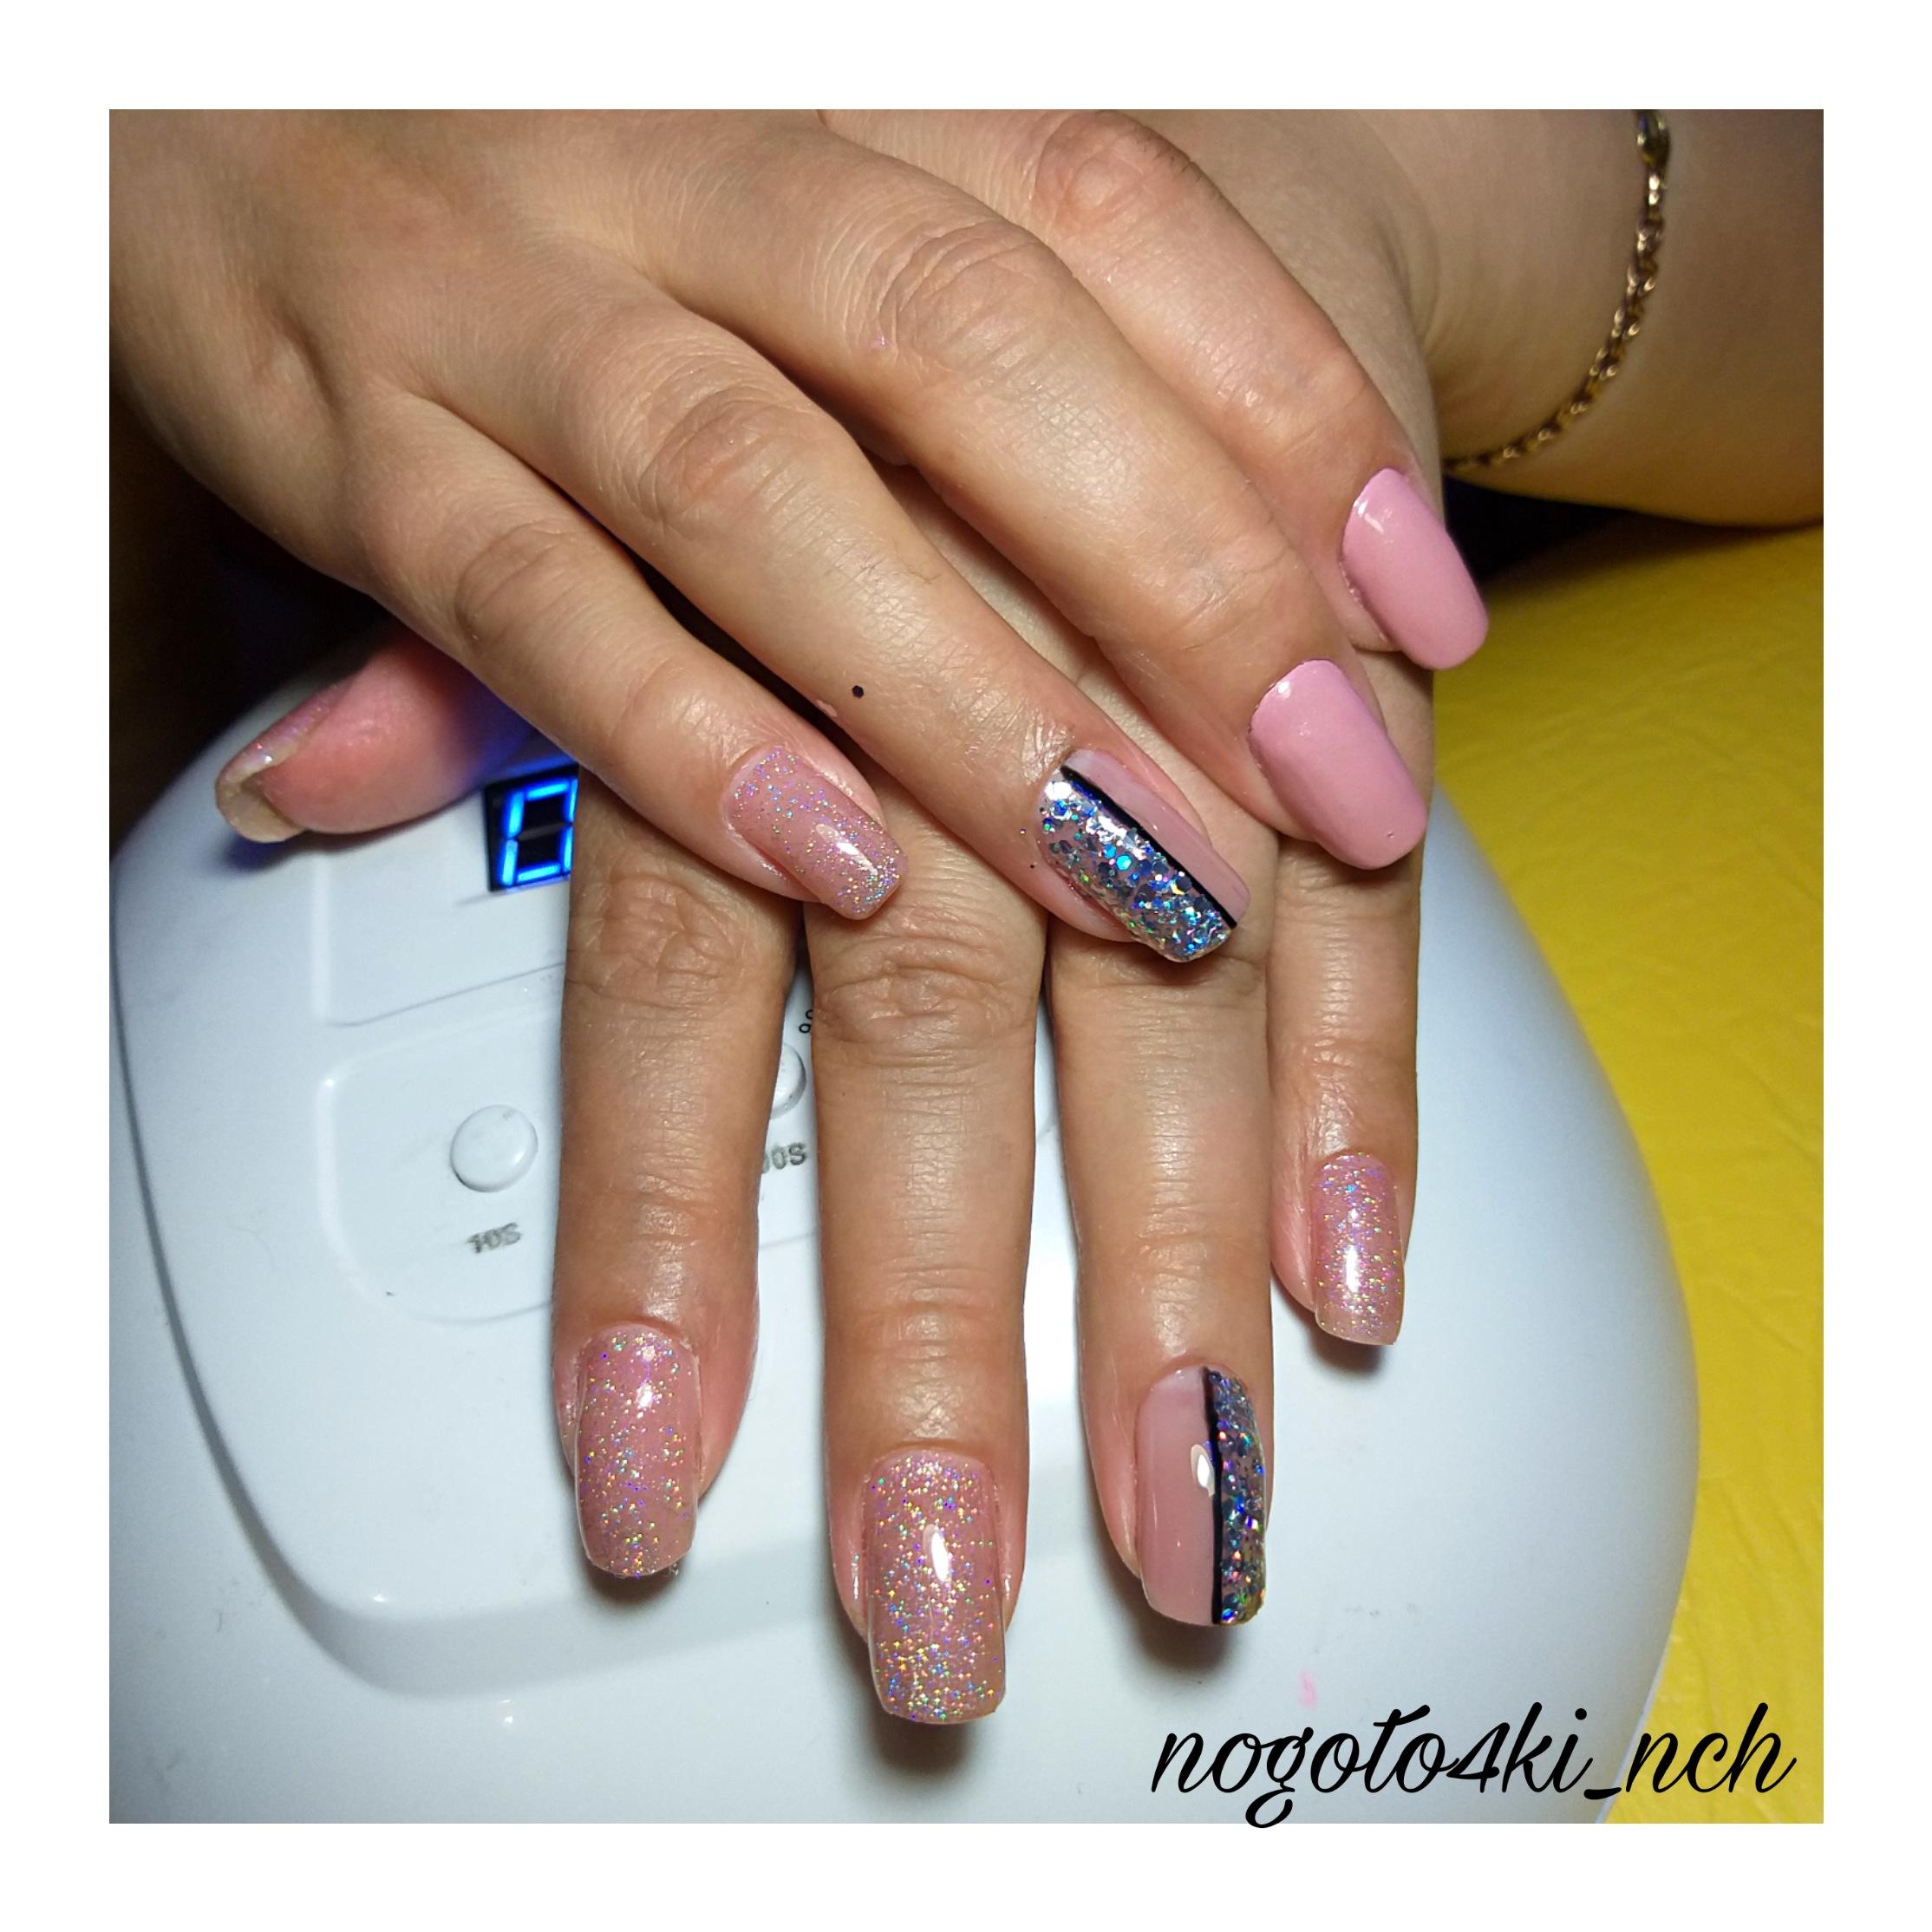 Маникюр с блестками и камифубуки в розовом цвете на короткие ногти.